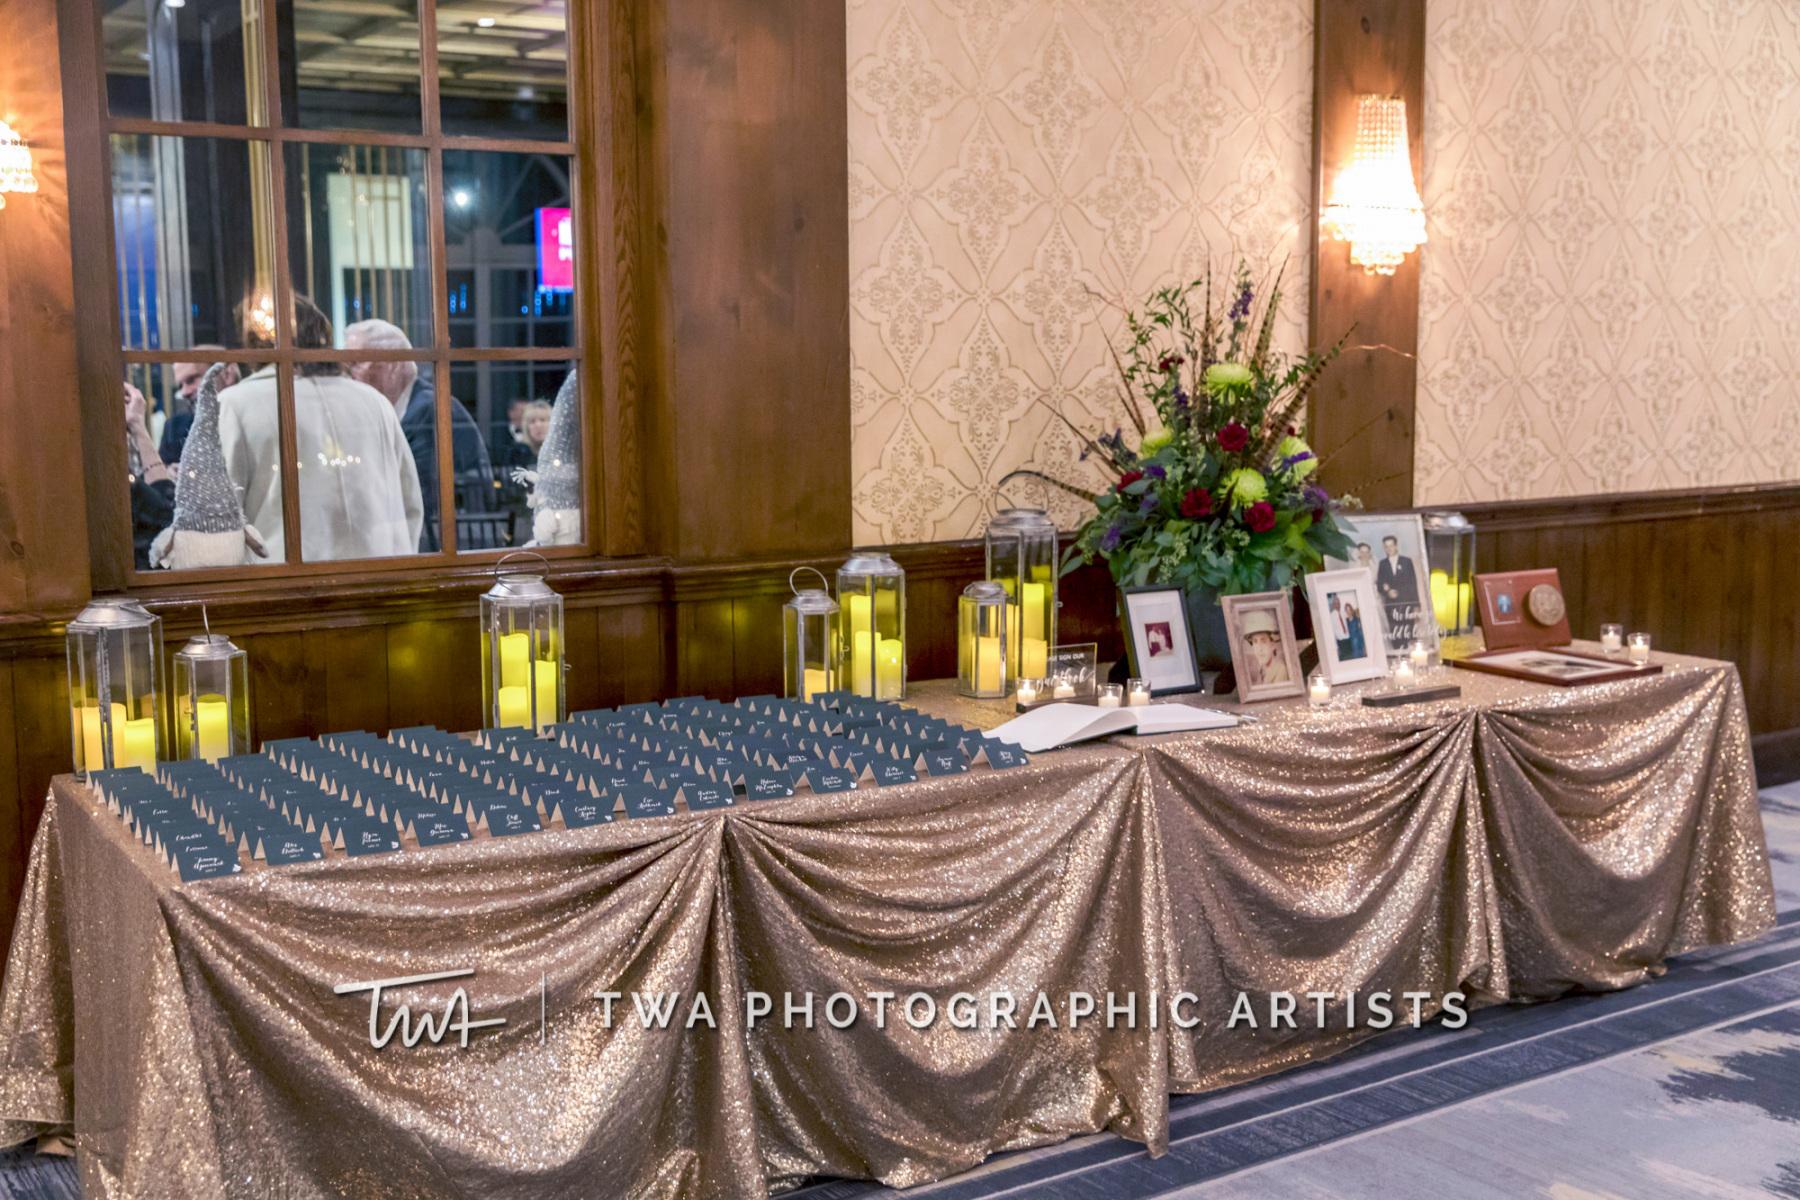 Chicago-Wedding-Photographer-TWA-Photographic-Artists-Drake-Hotel_Meyer_Mitchell_MC_DR-1251